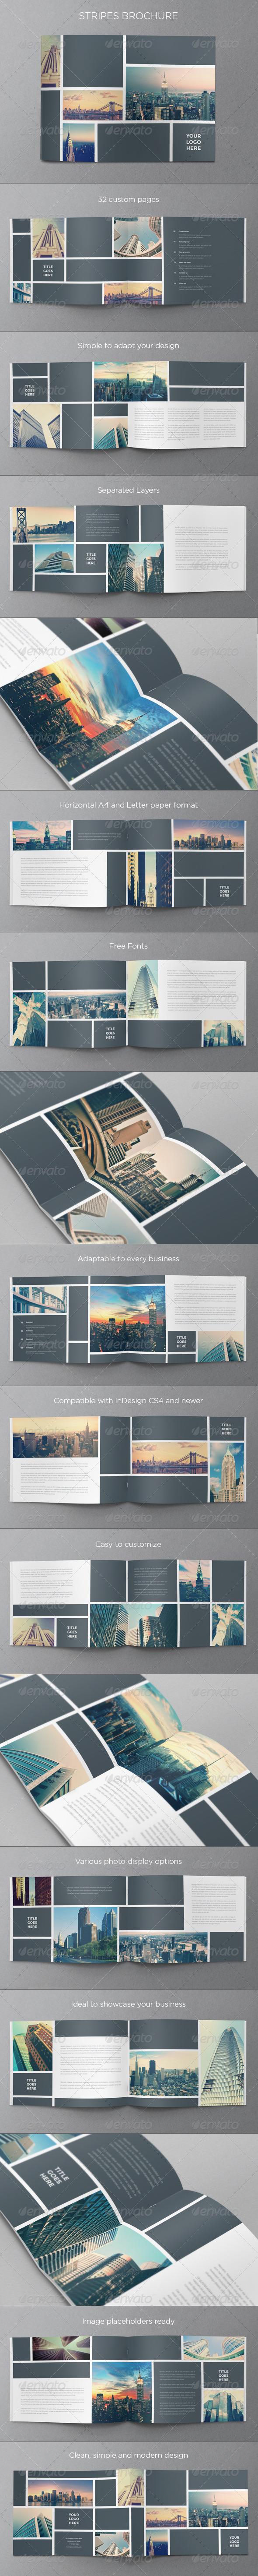 GraphicRiver Real Estate Stripes Brochure 6058277